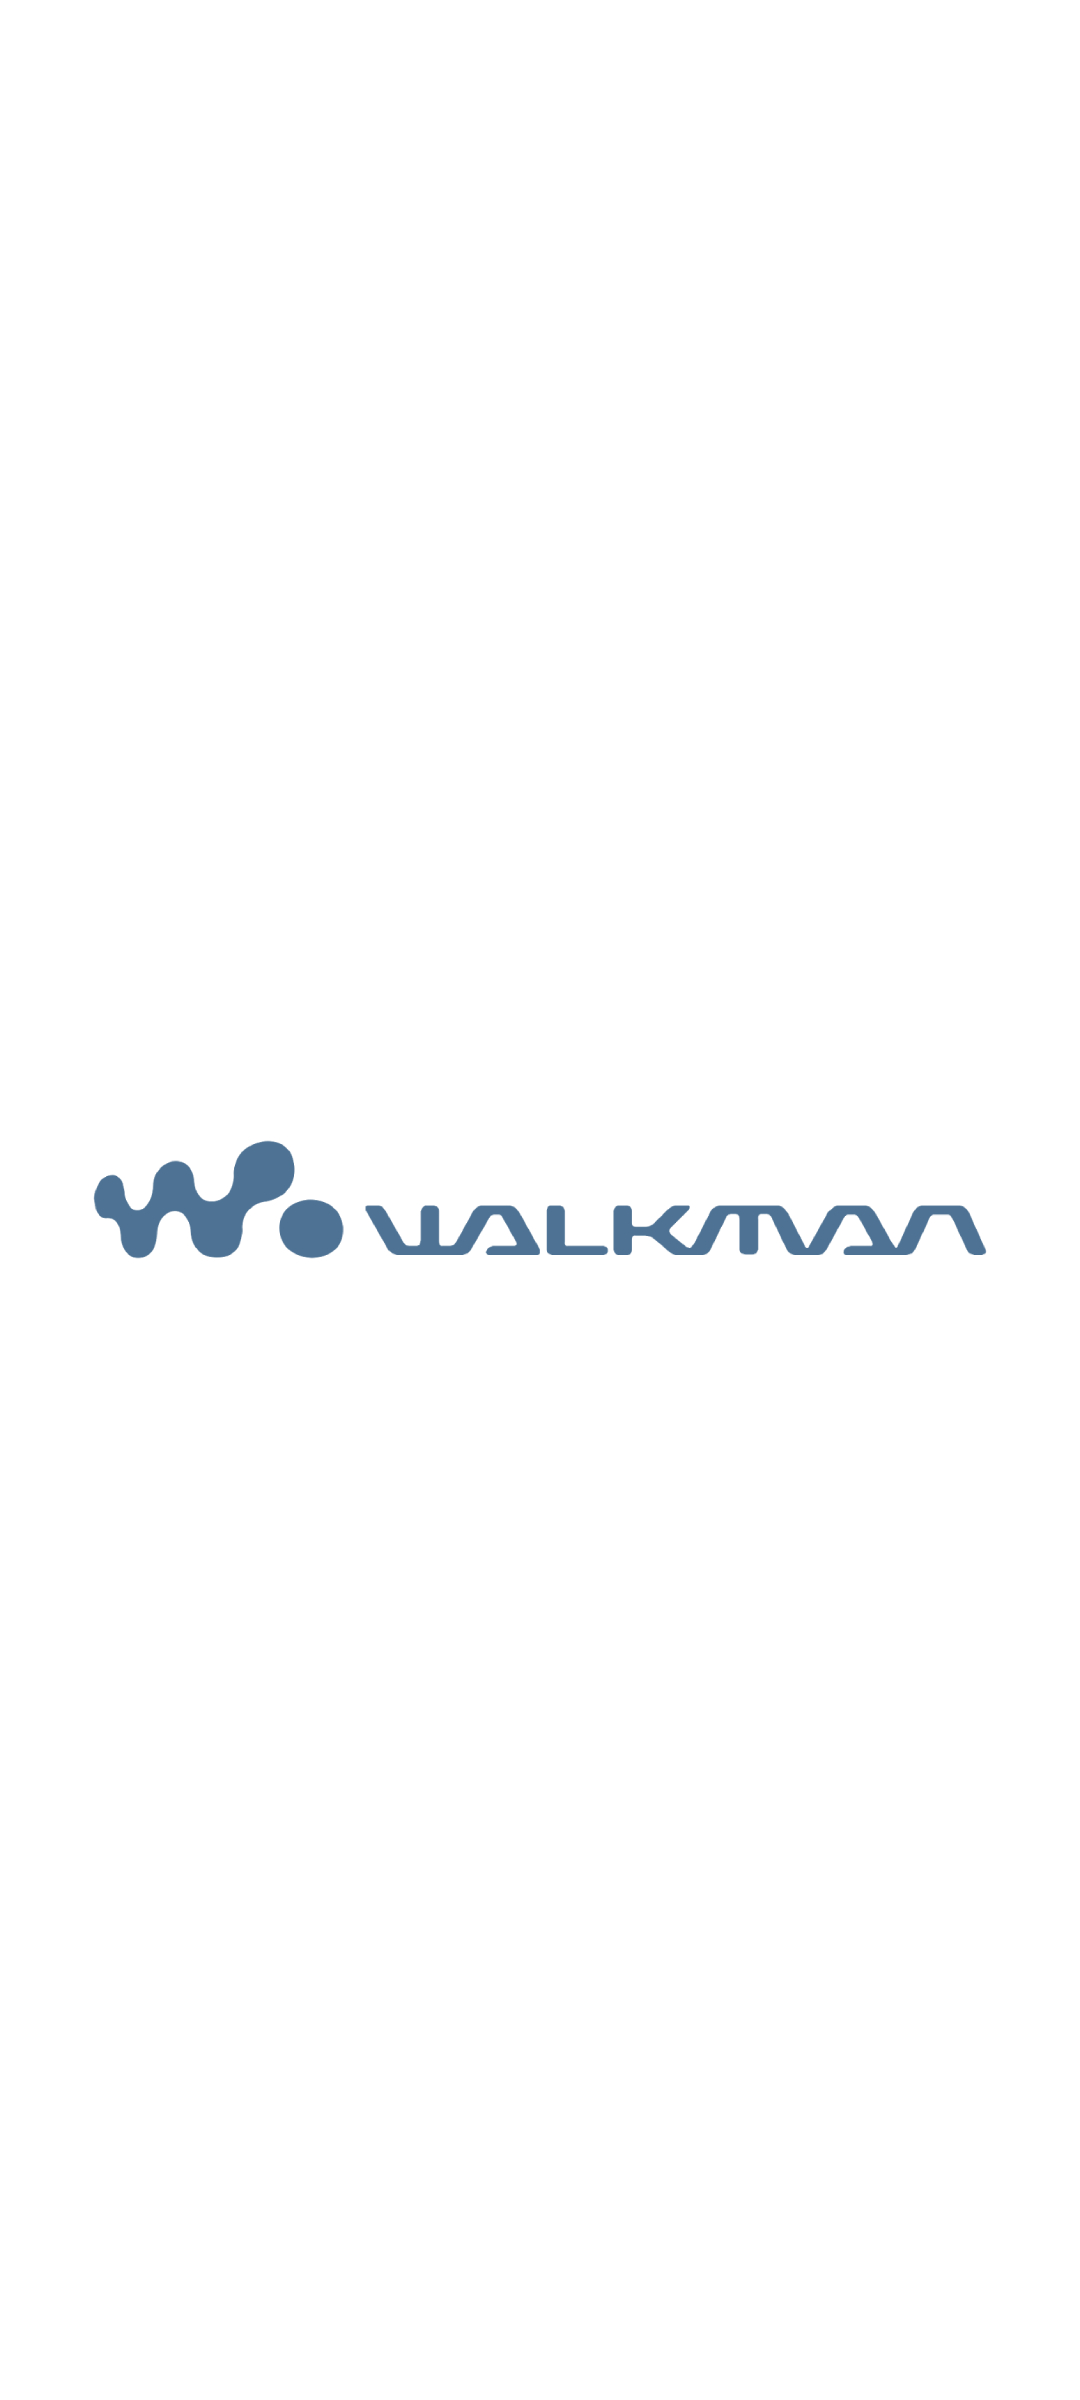 Walkman ウォークマン ZenFone 7 Pro スマホ壁紙・待ち受け